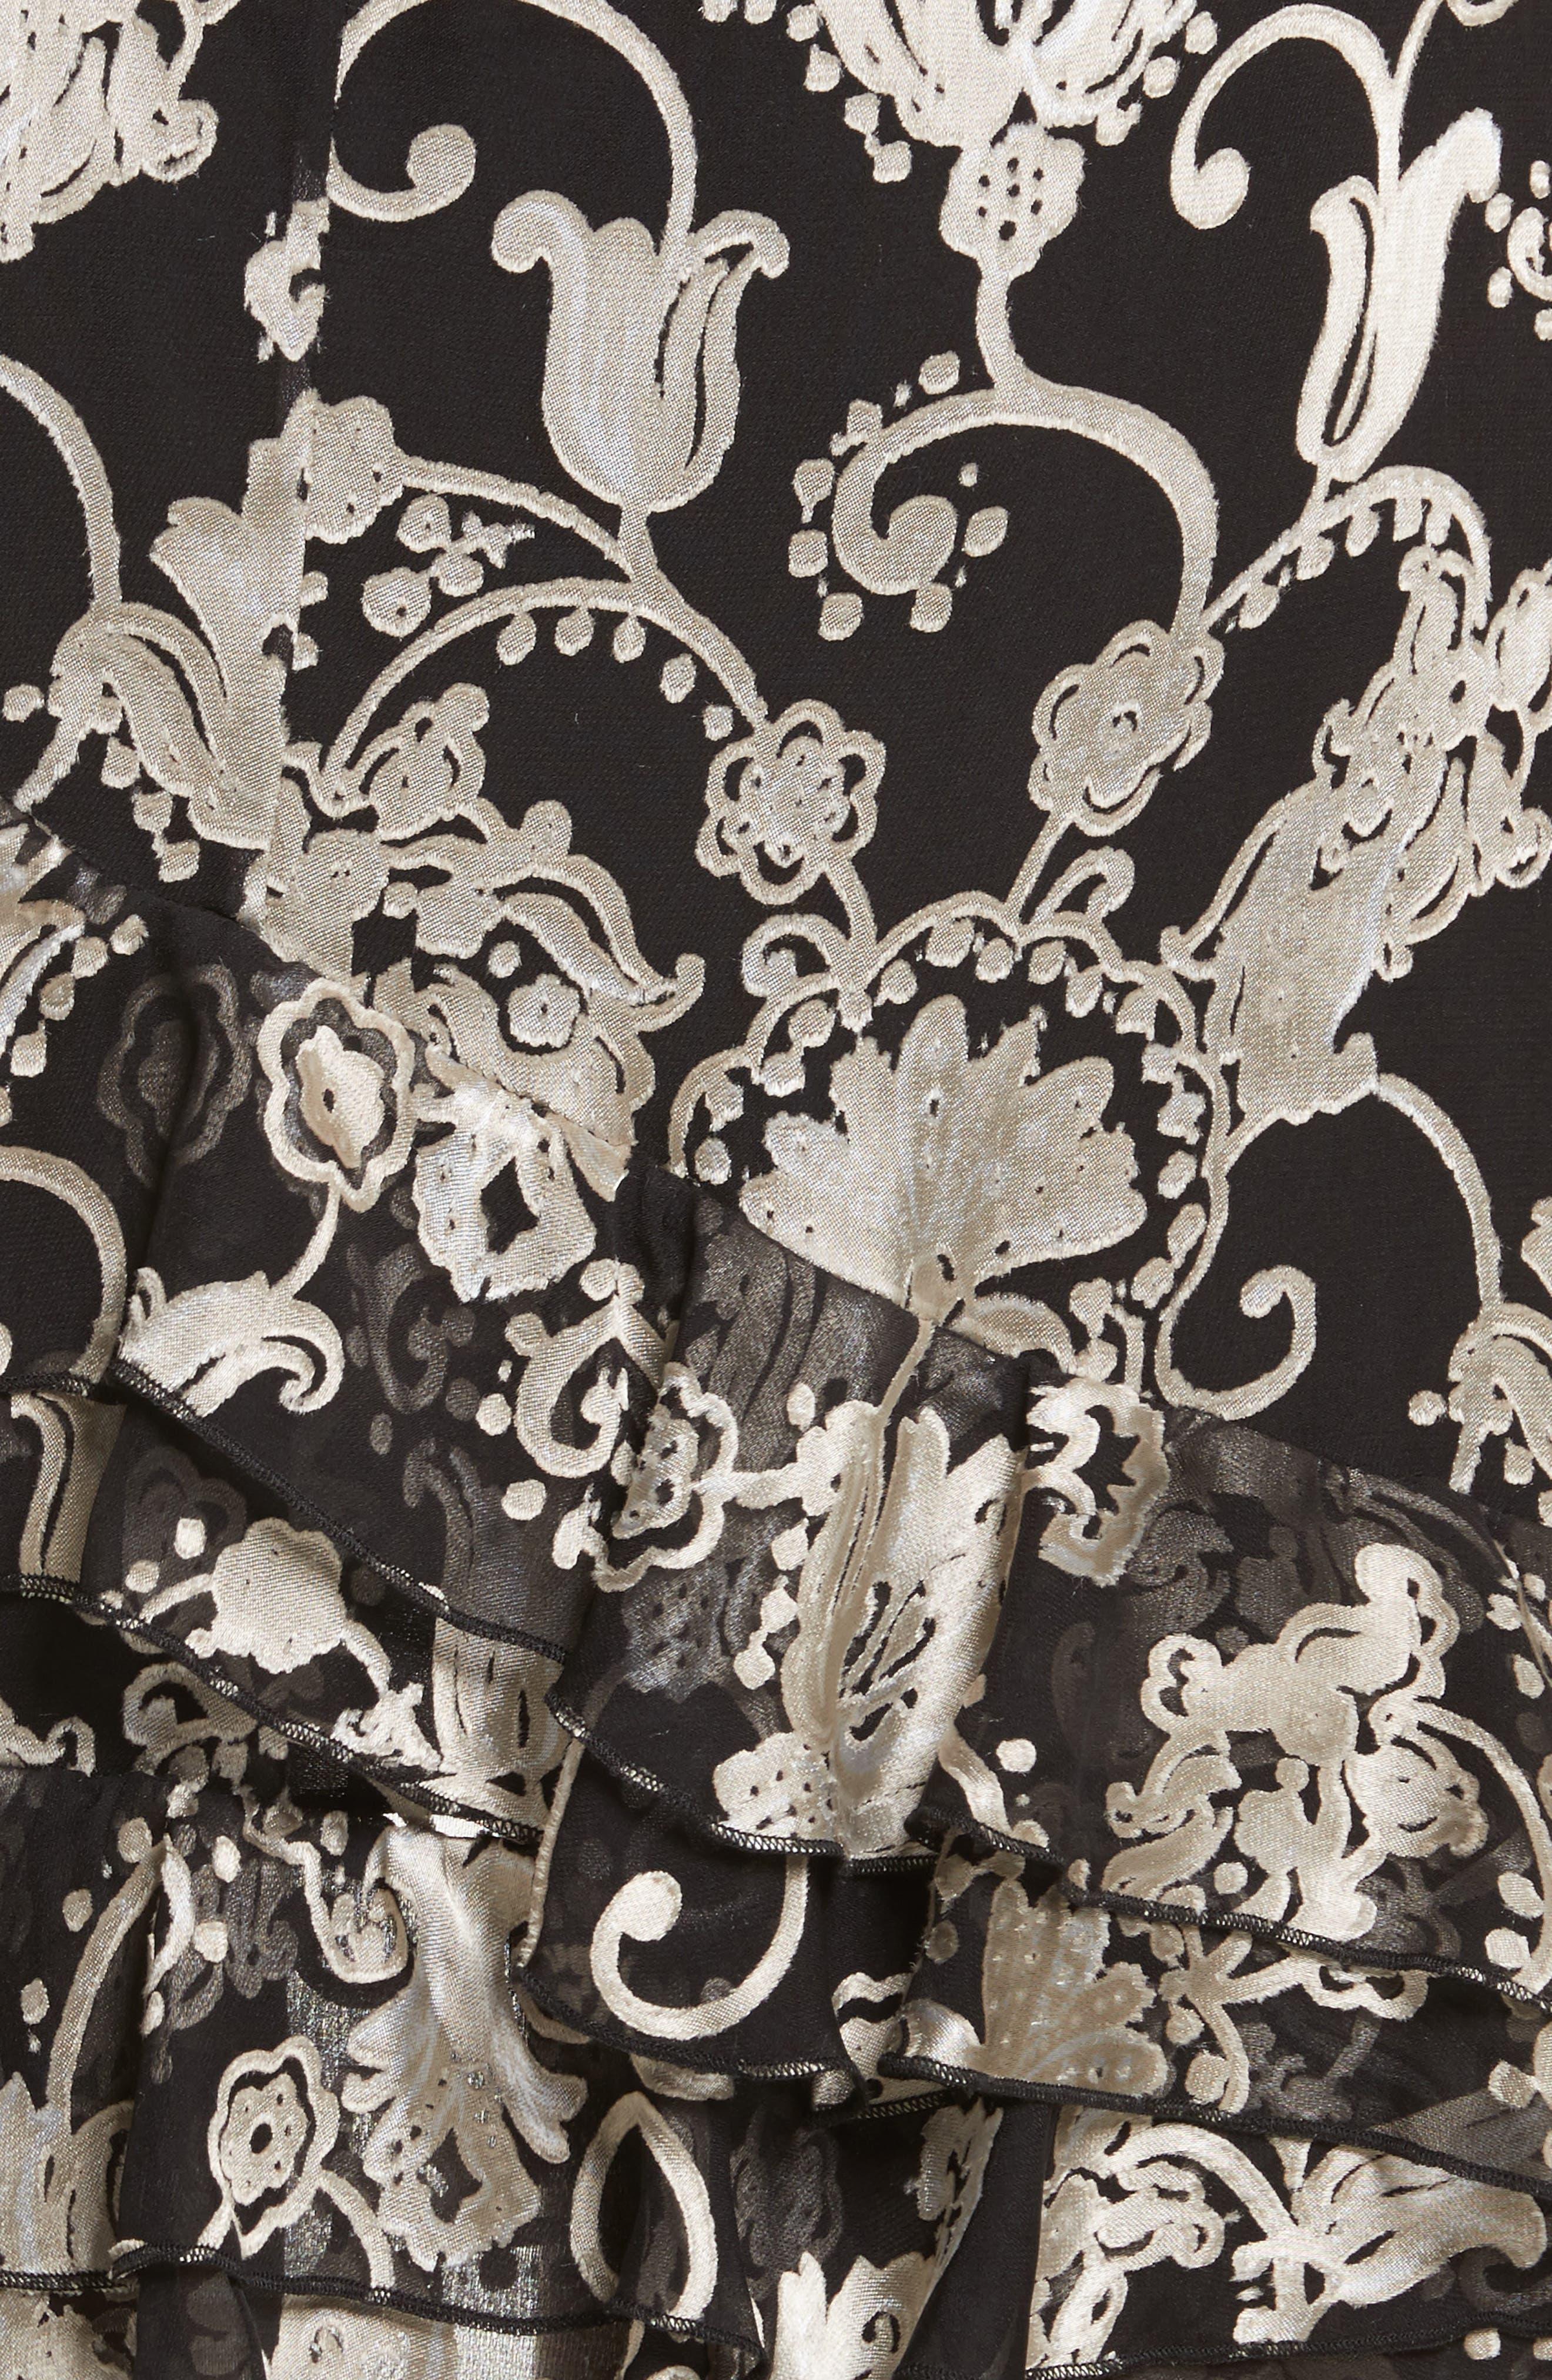 Sasha Asymmetrical Tiered Ruffle Skirt,                             Alternate thumbnail 6, color,                             Black/ White